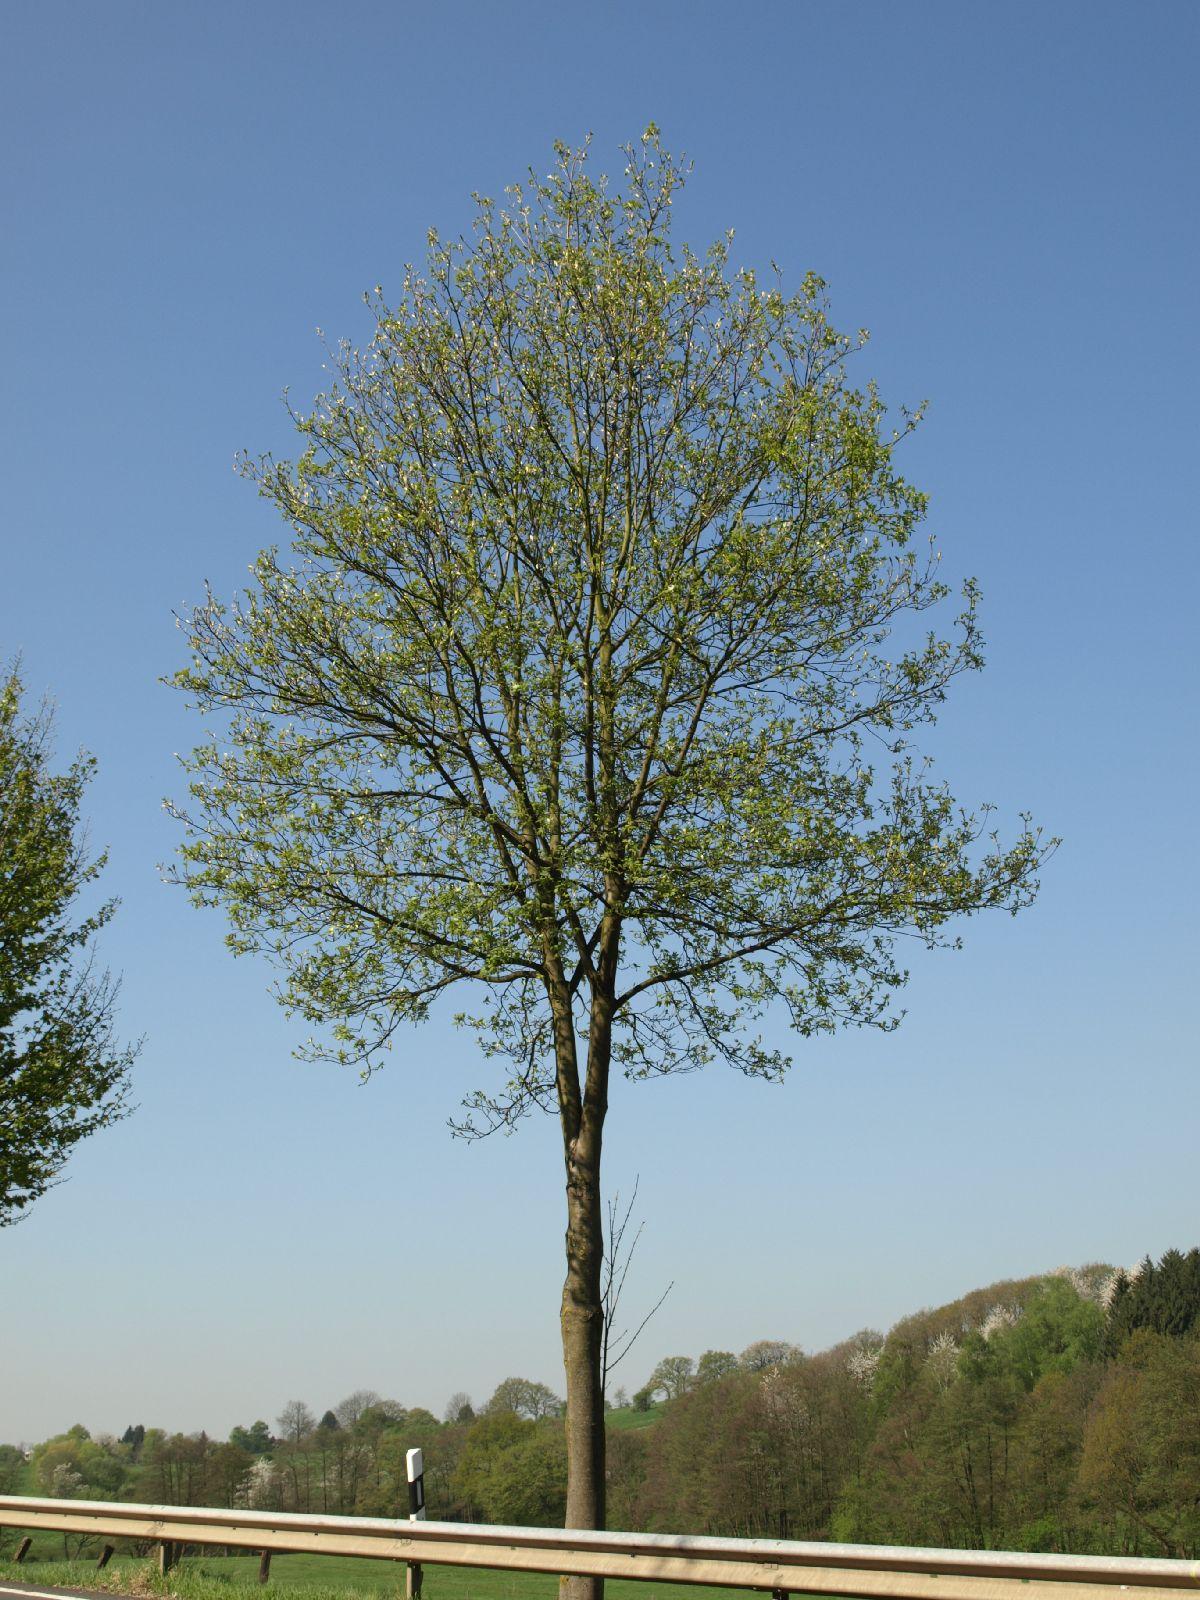 Plants-Trees_Photo_Texture_B_P4212494